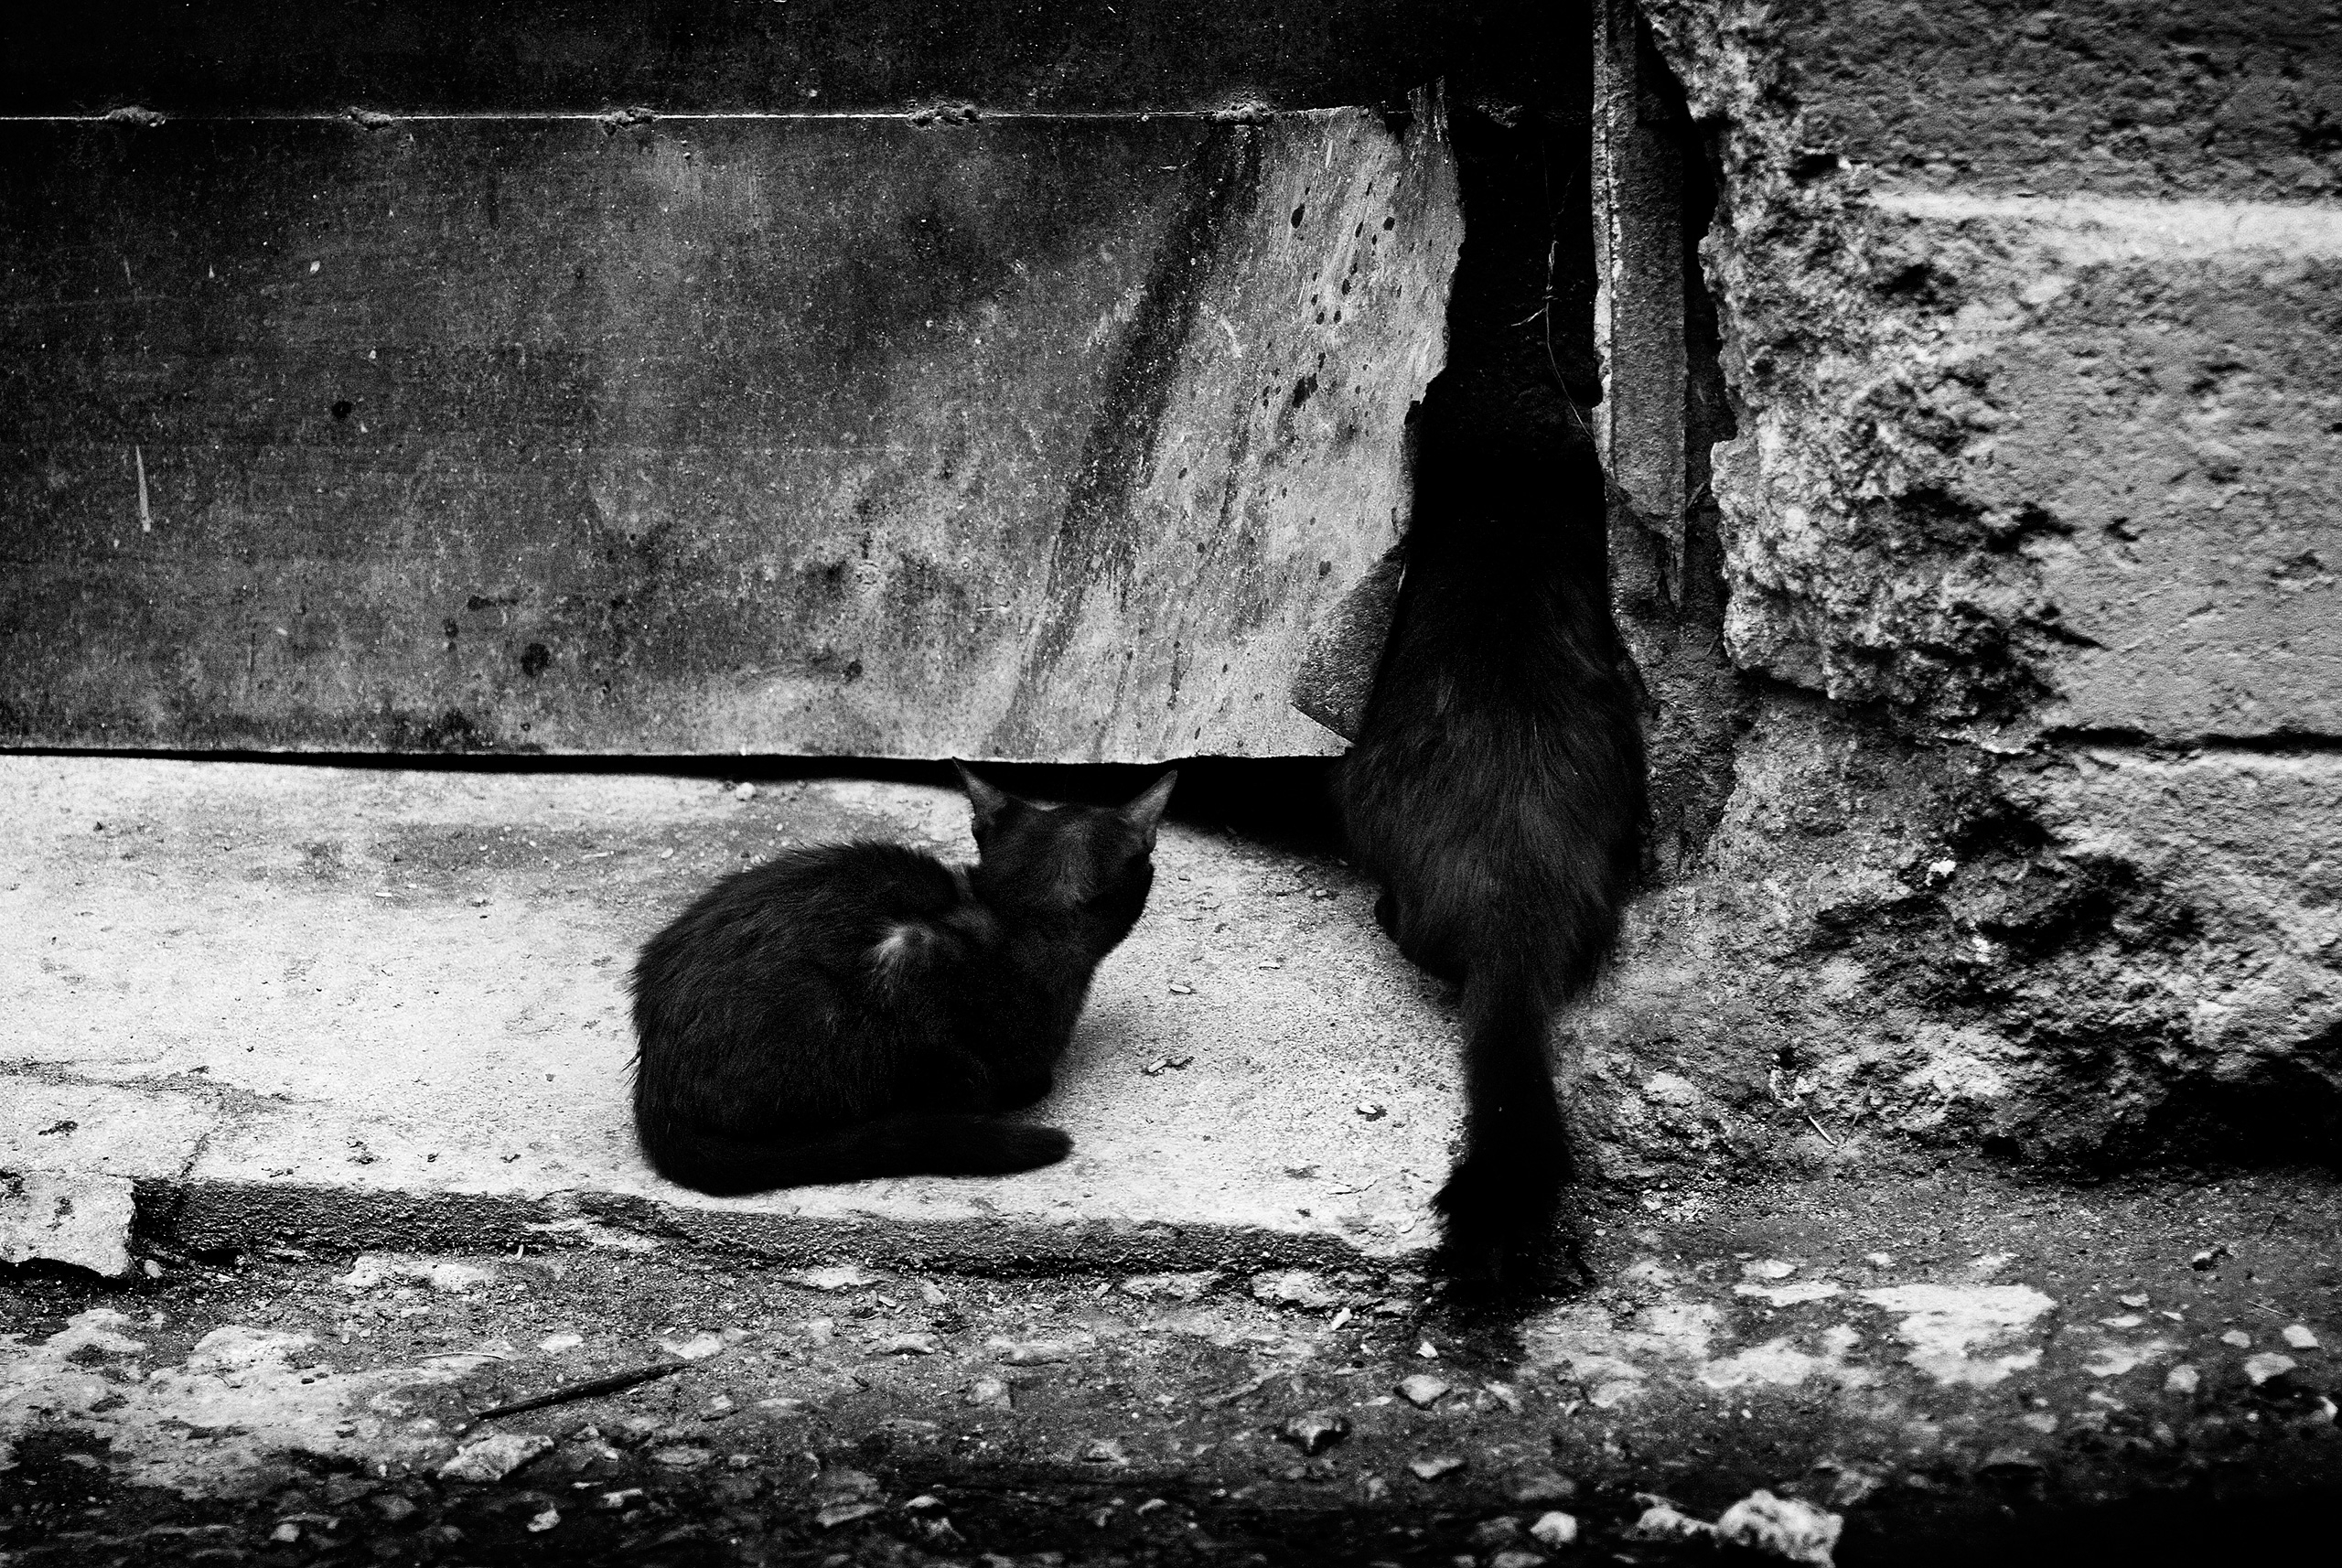 mystery curiosity - Habana, Cuba - christofkessemeier | ello